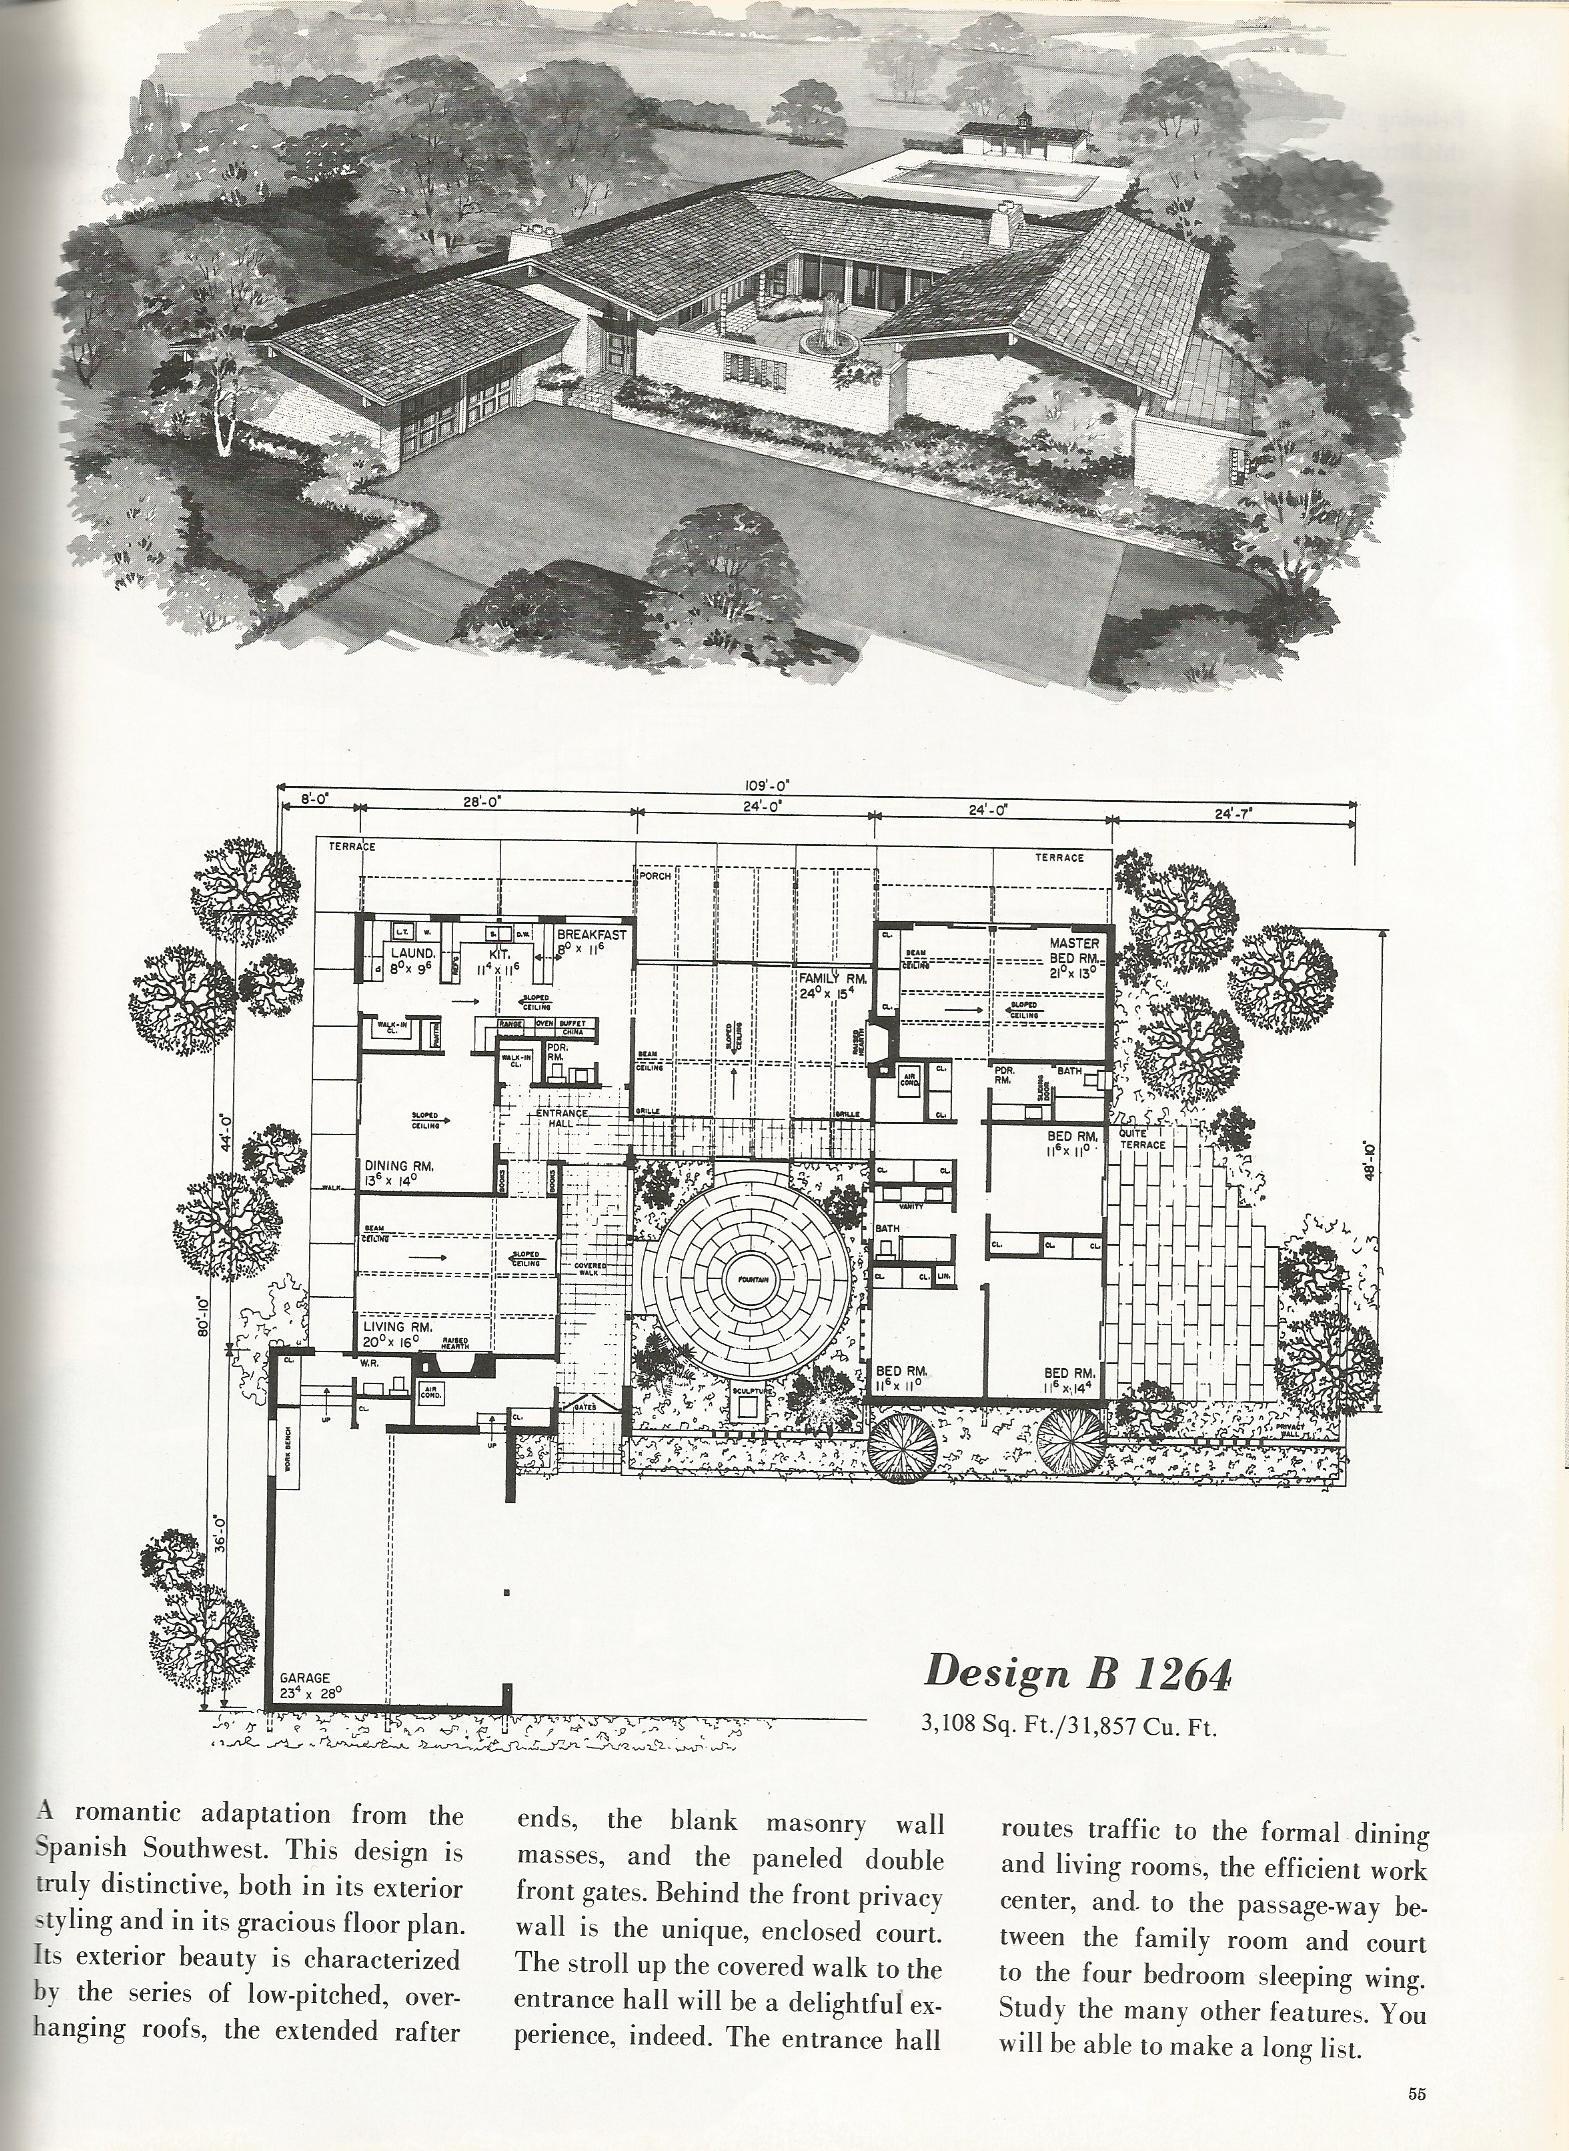 Vintage house plans 1264 antique alter ego for Retro house plans